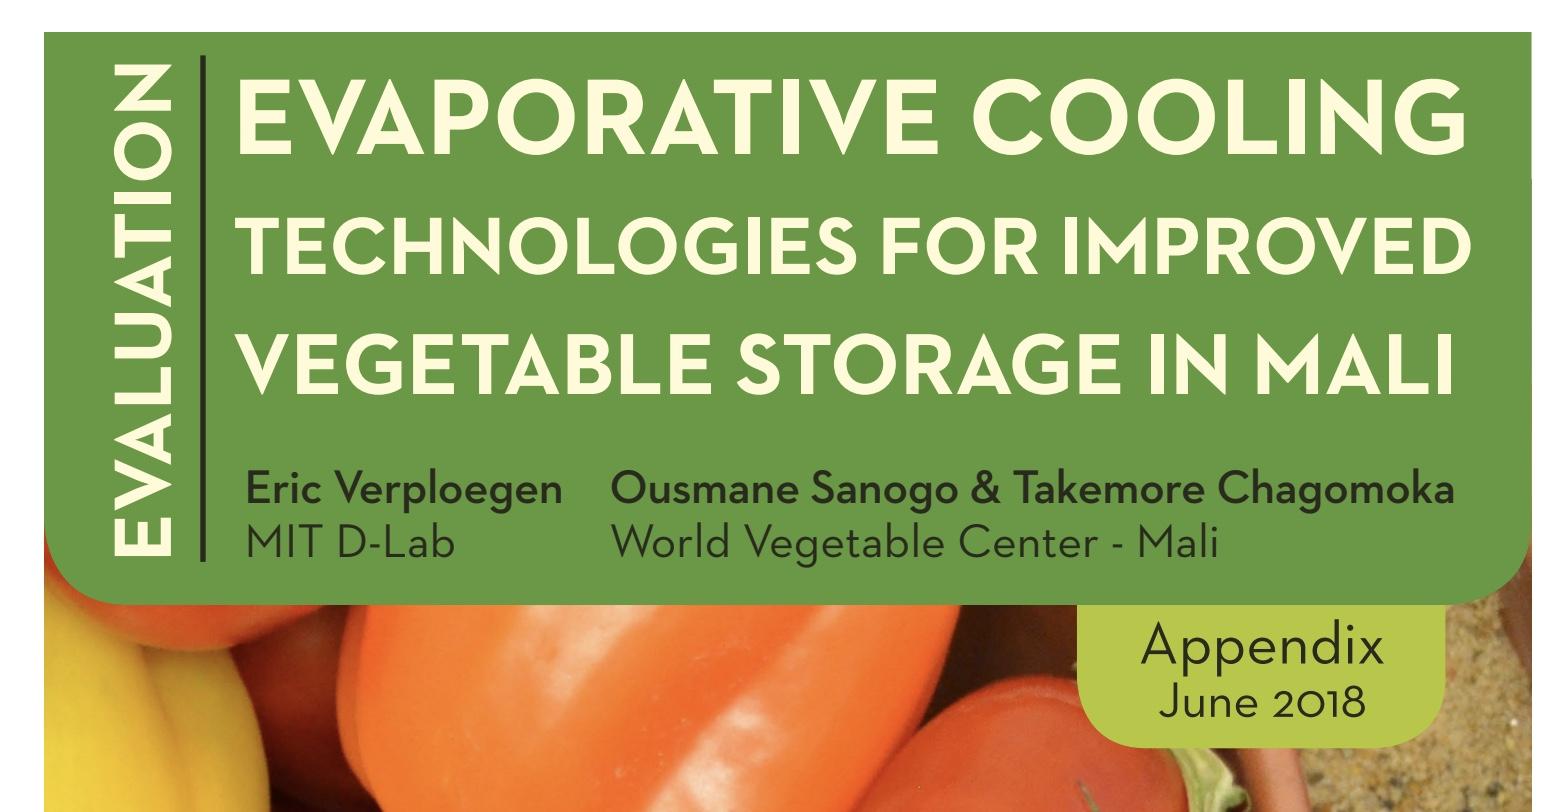 Evaporative Cooling Technologies For Improved Vegetable